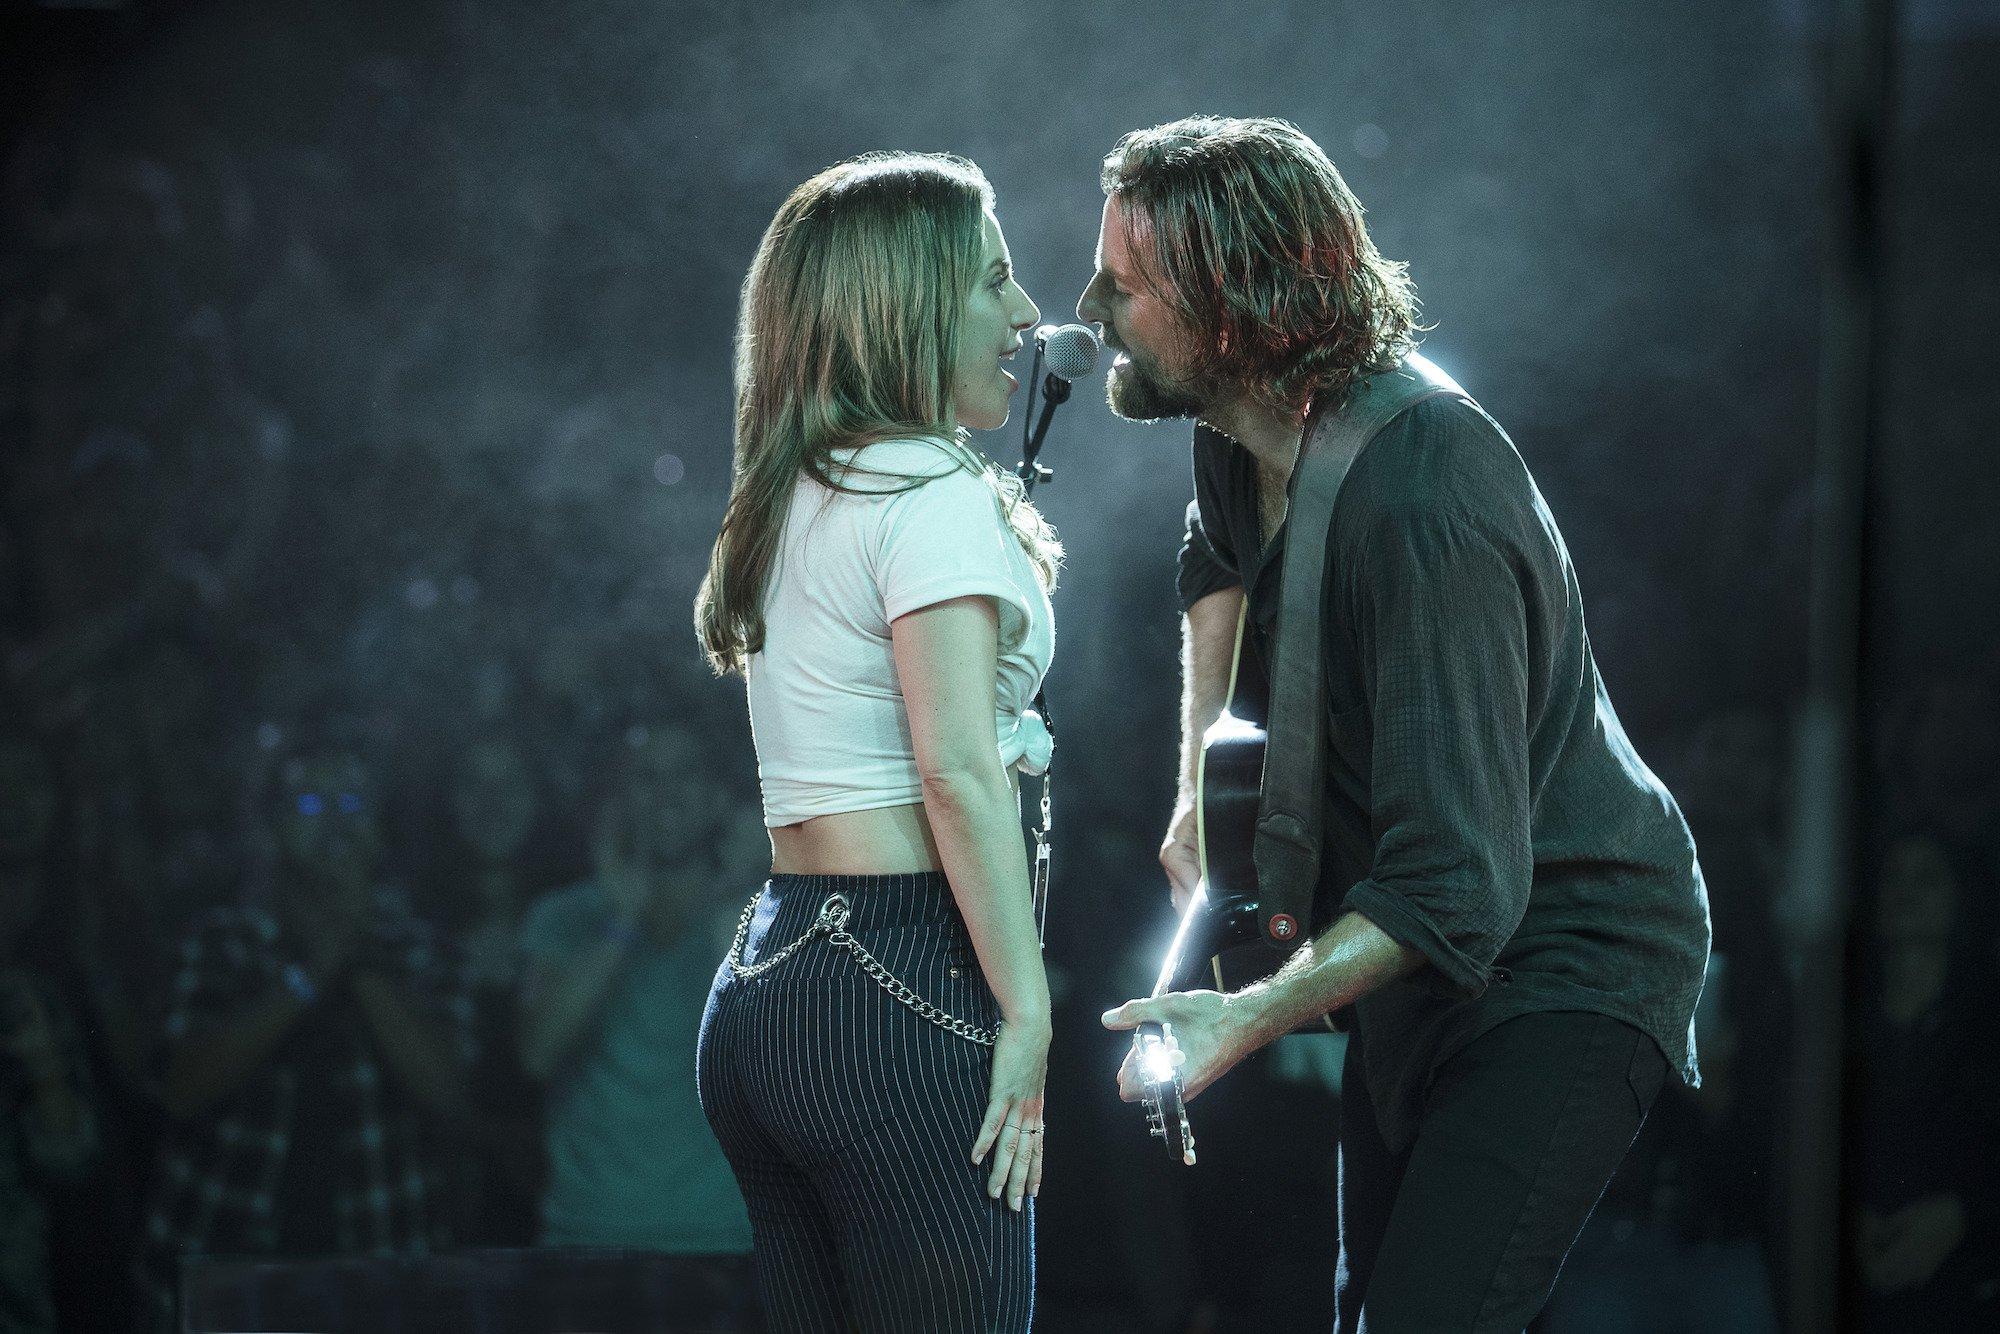 Credit: Warner Bros/Clay Enos Bradley Cooper Lady Gaga